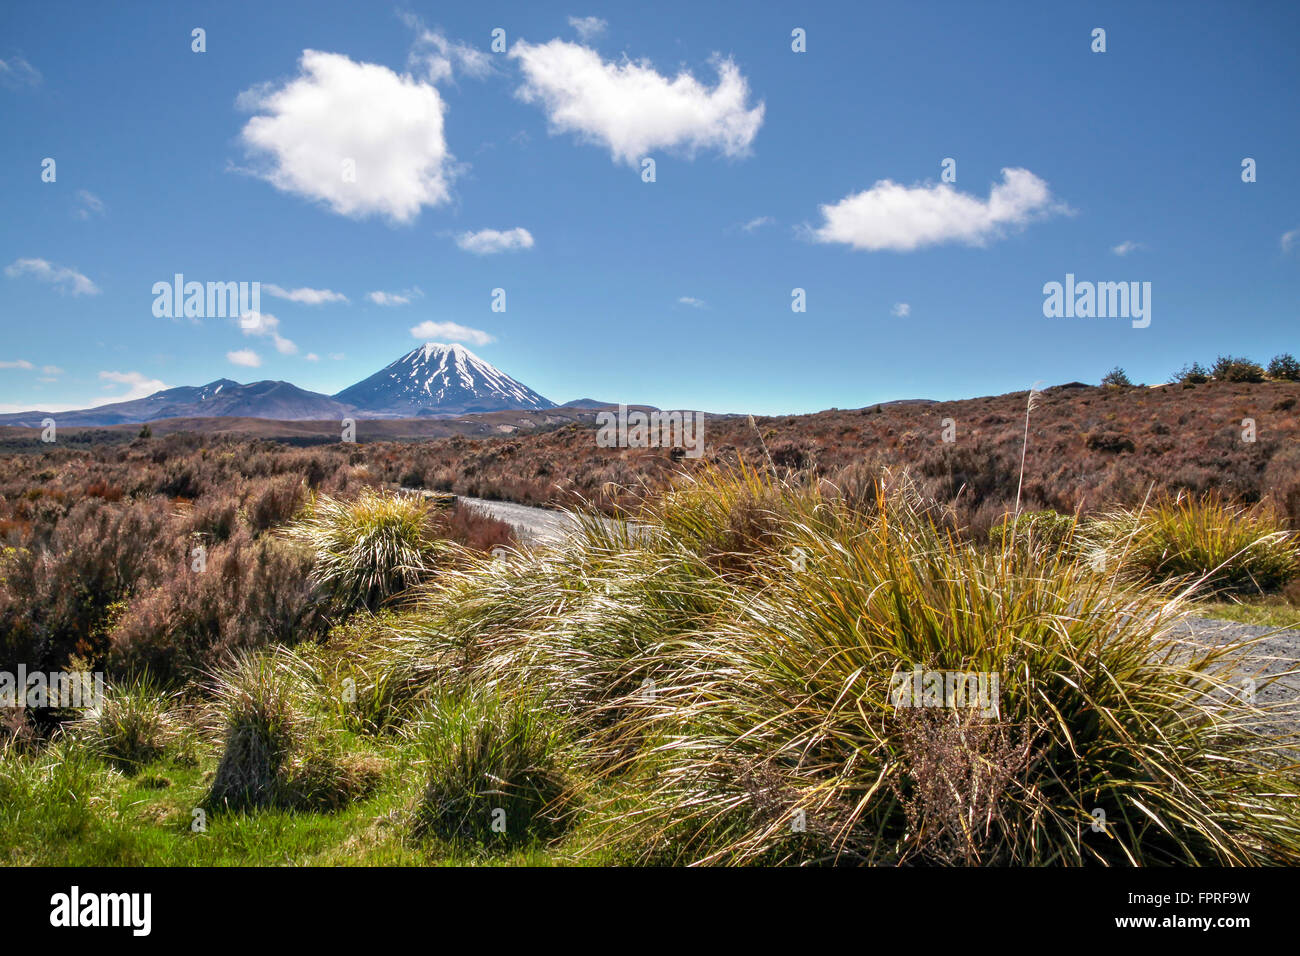 Mount Ngauruhoe in Tongariro National Park, Manawatu-Wanganui, New Zealand - Stock Image